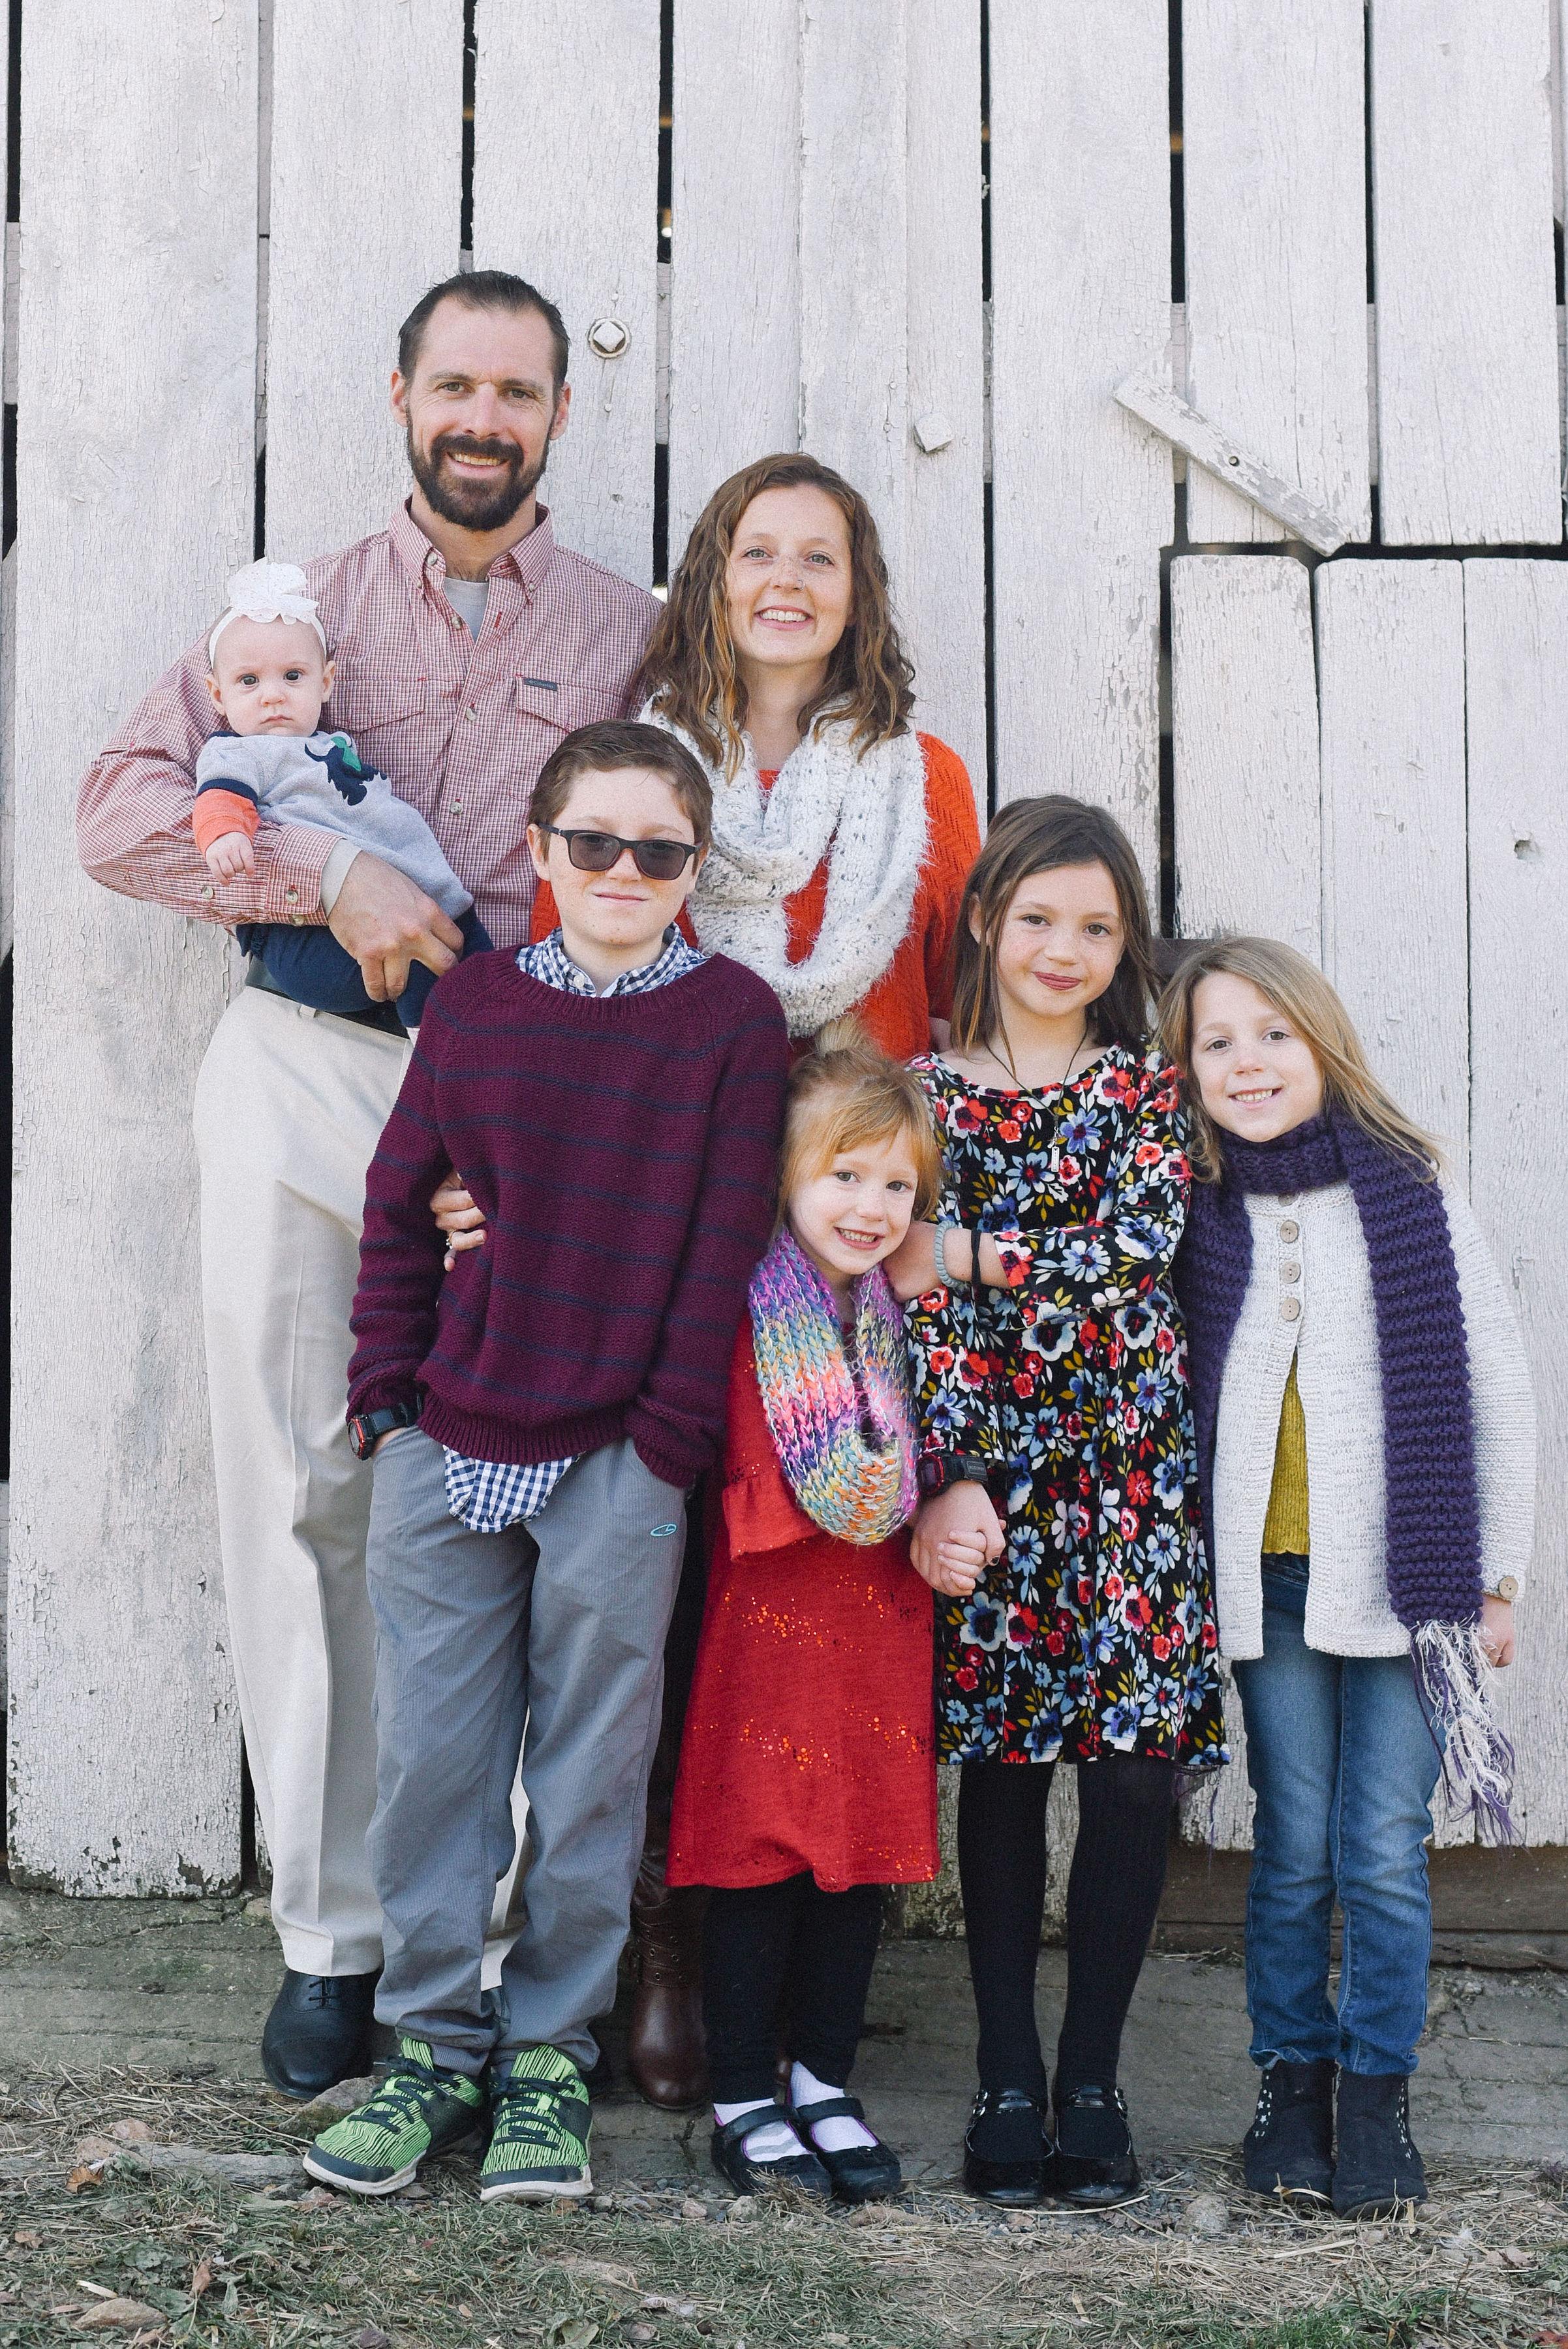 maryland_family_photographer_extended_family_session-15.jpg